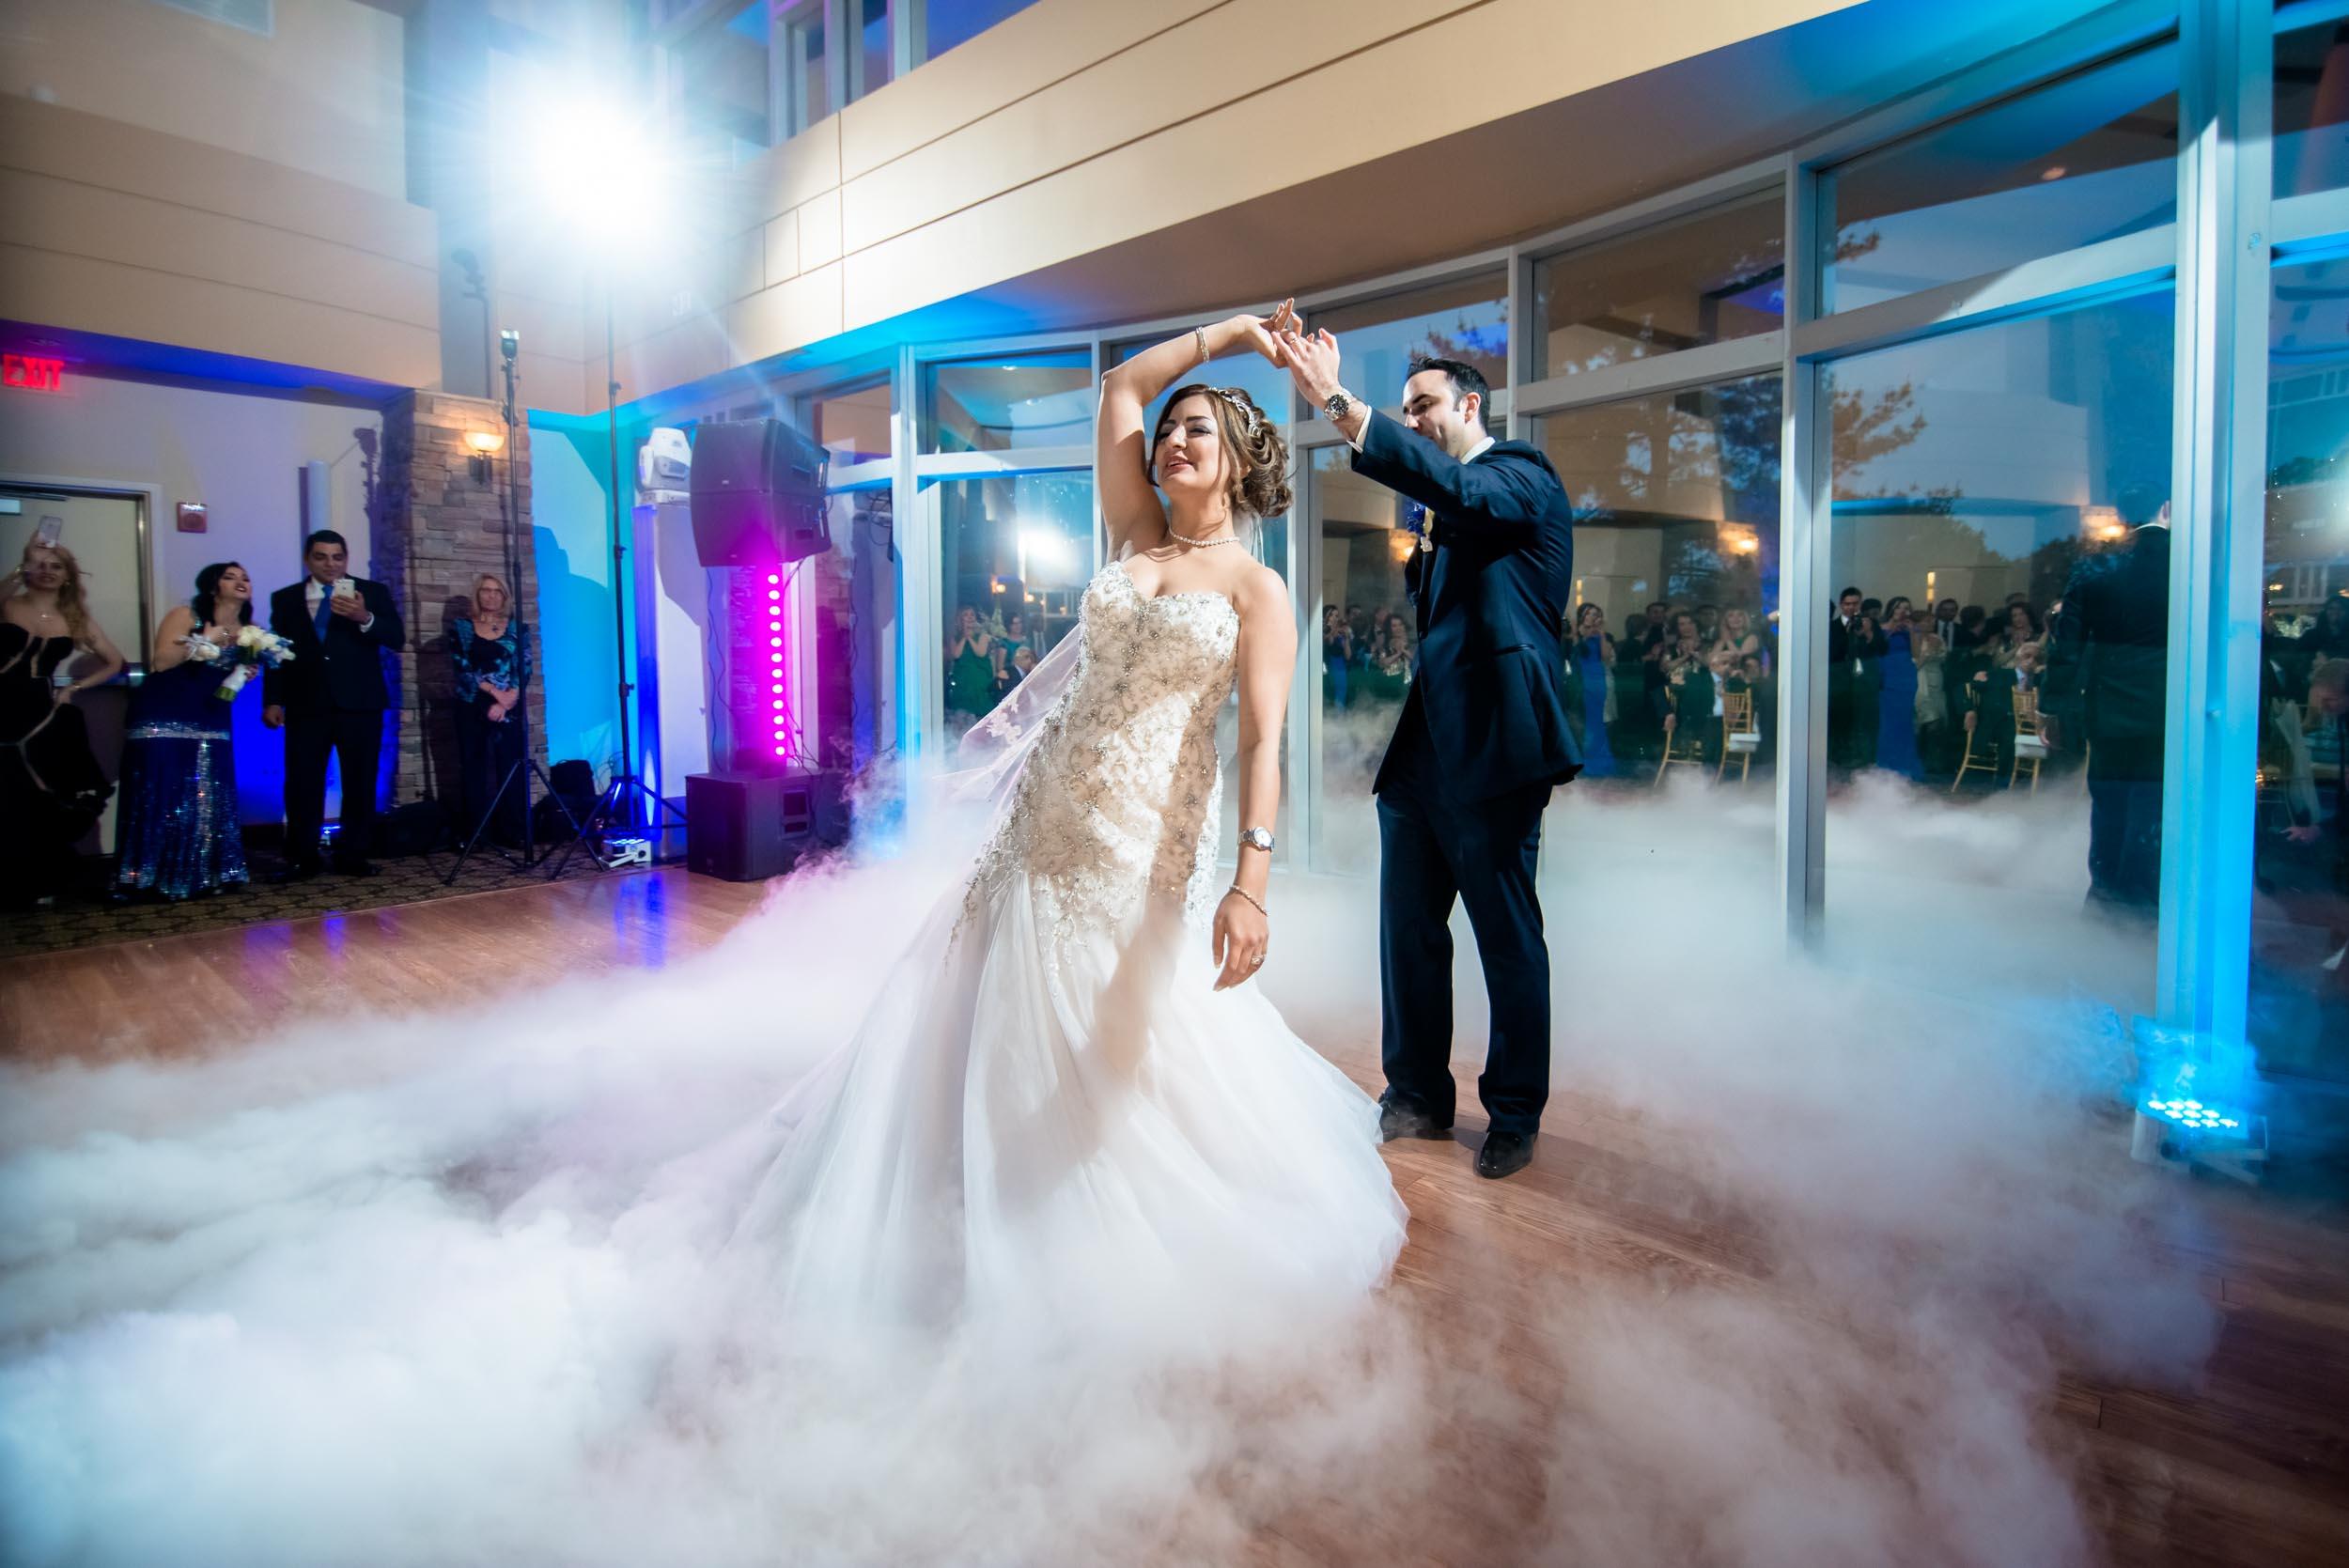 dc+metro+wedding+photographer+vadym+guliuk+photography+wedding+first+dance-2023.jpg